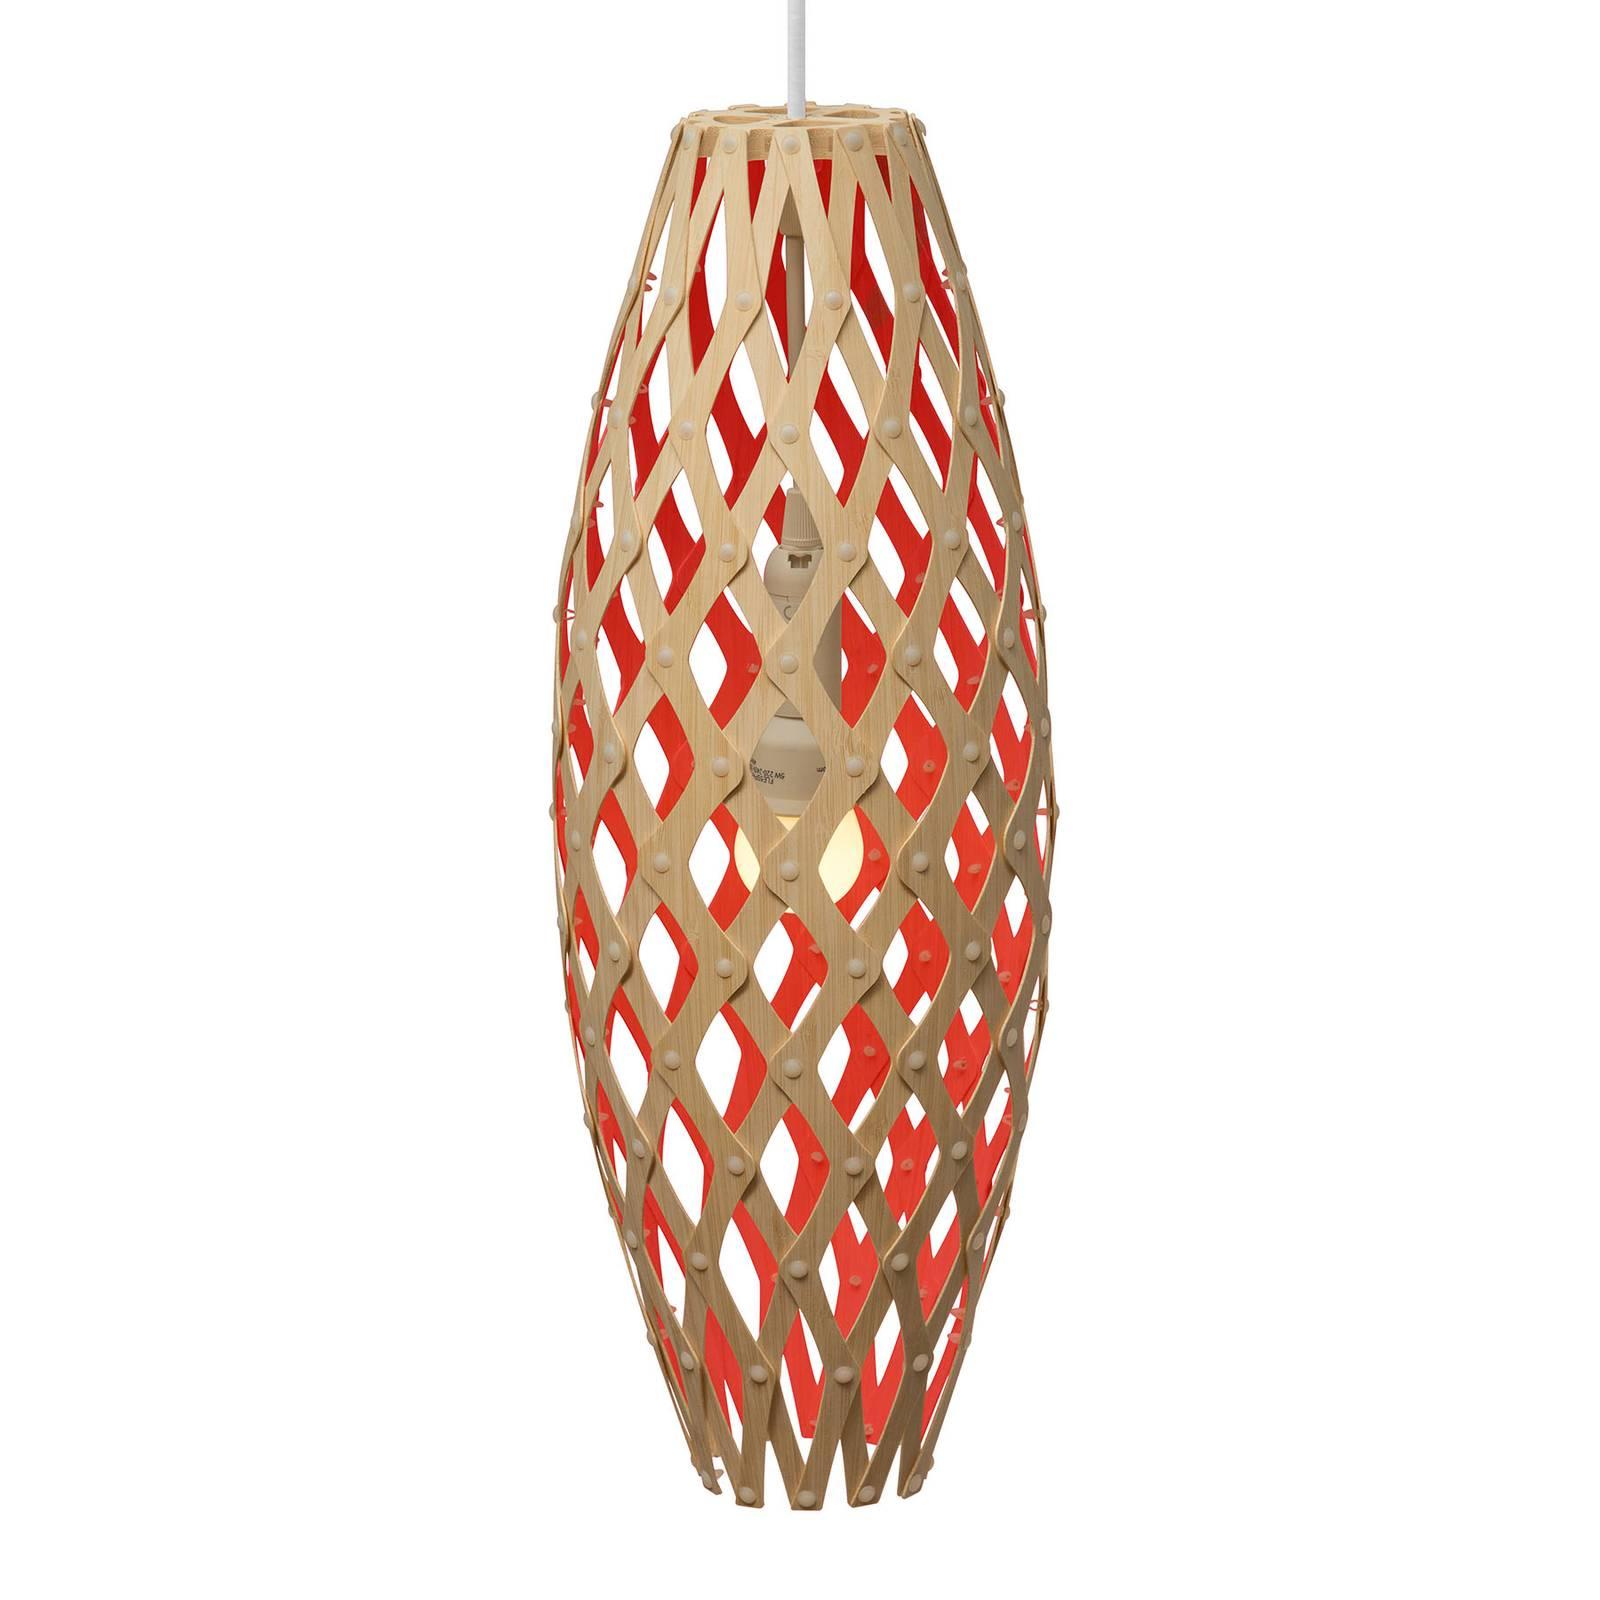 david trubridge Hinaki -riippuvalo 50 cm, bambu